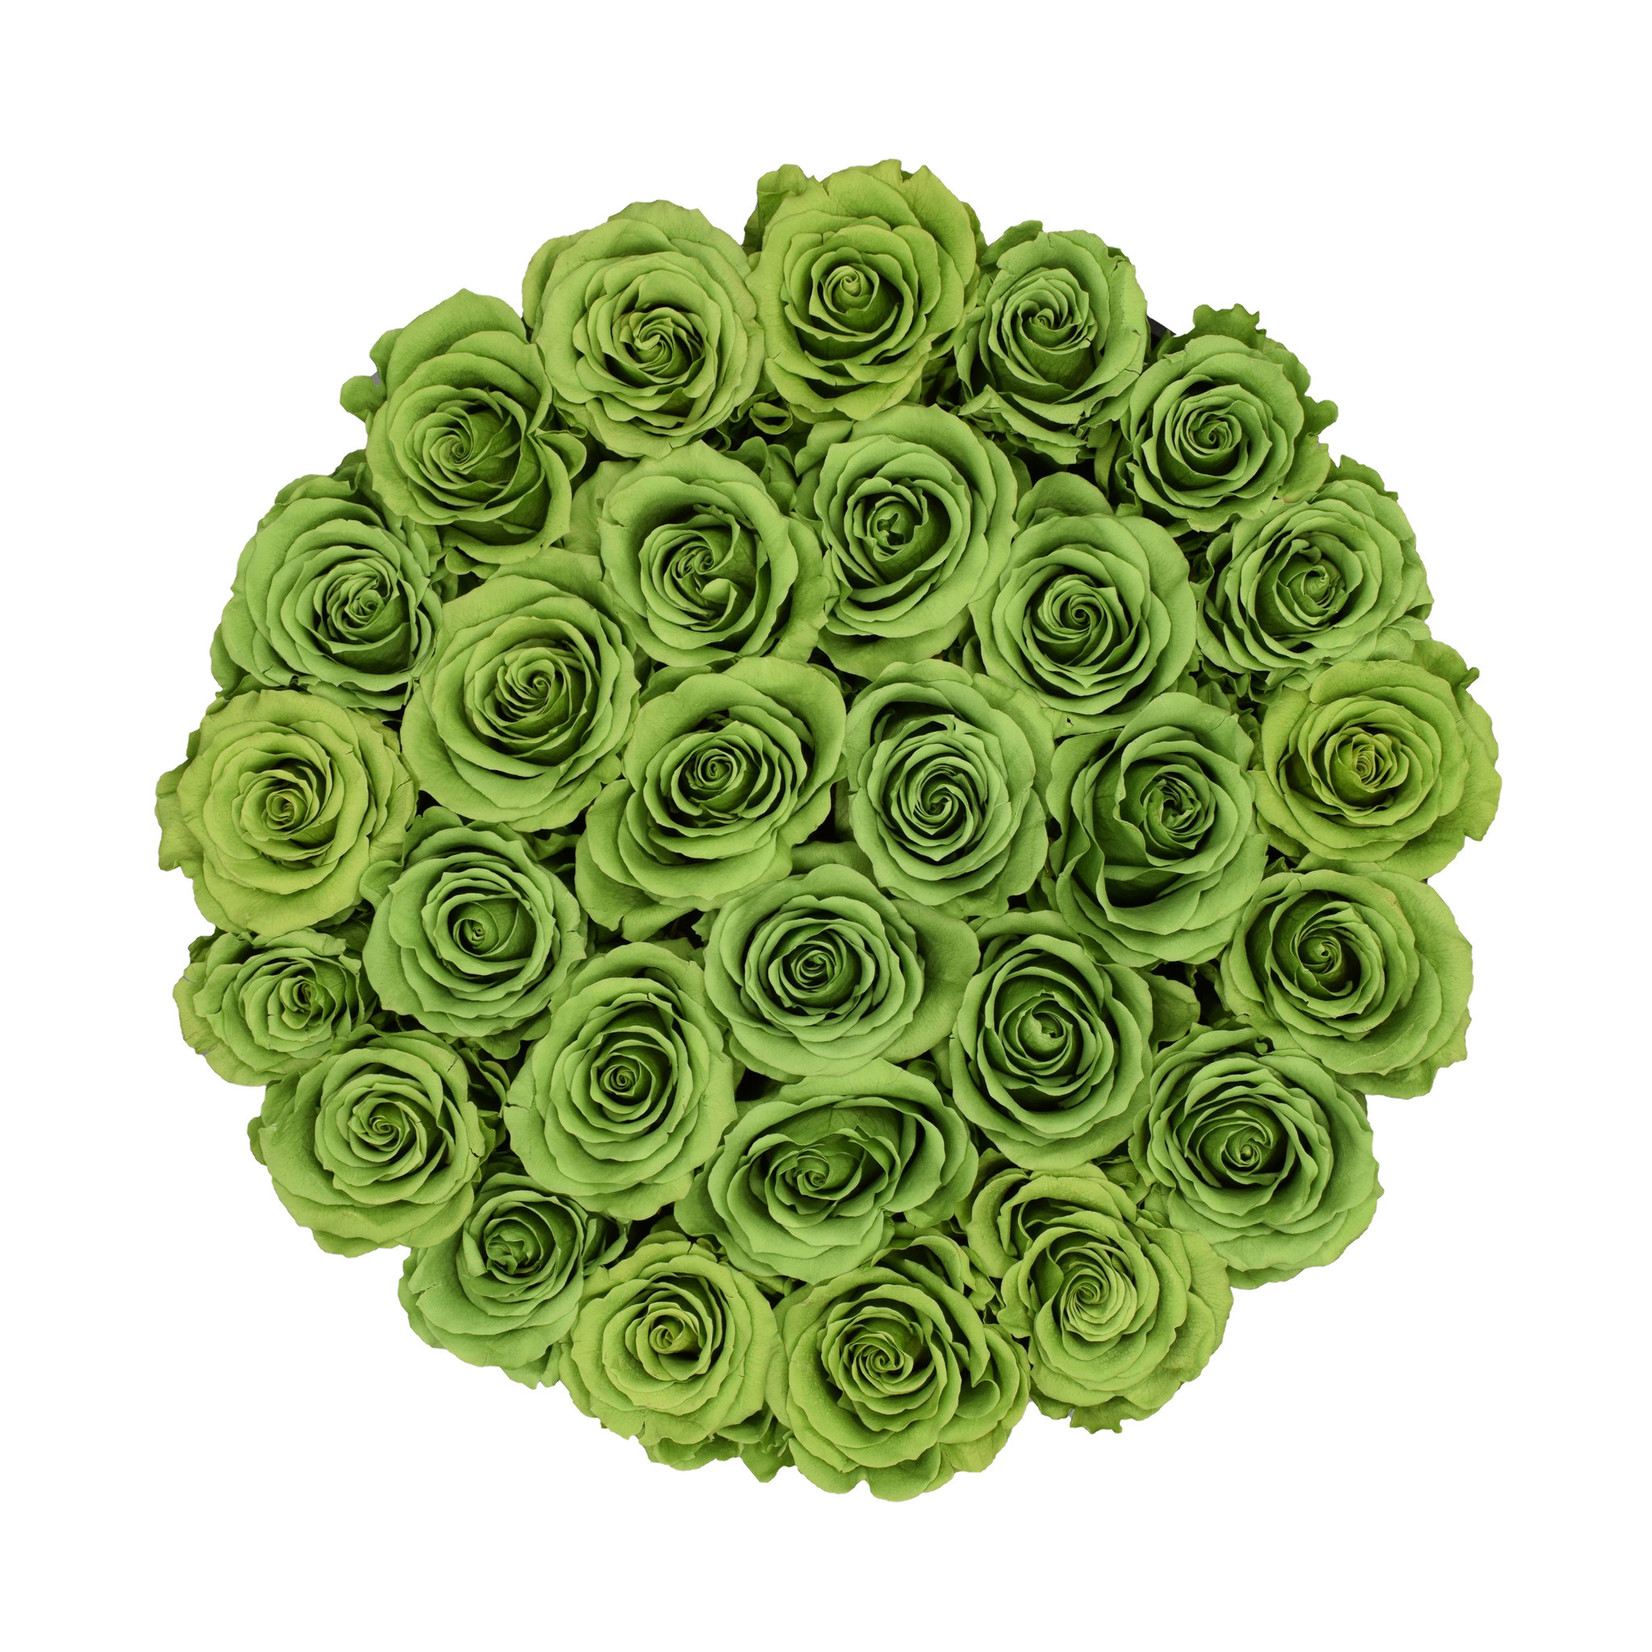 Large - Green Endless Roses - White Box